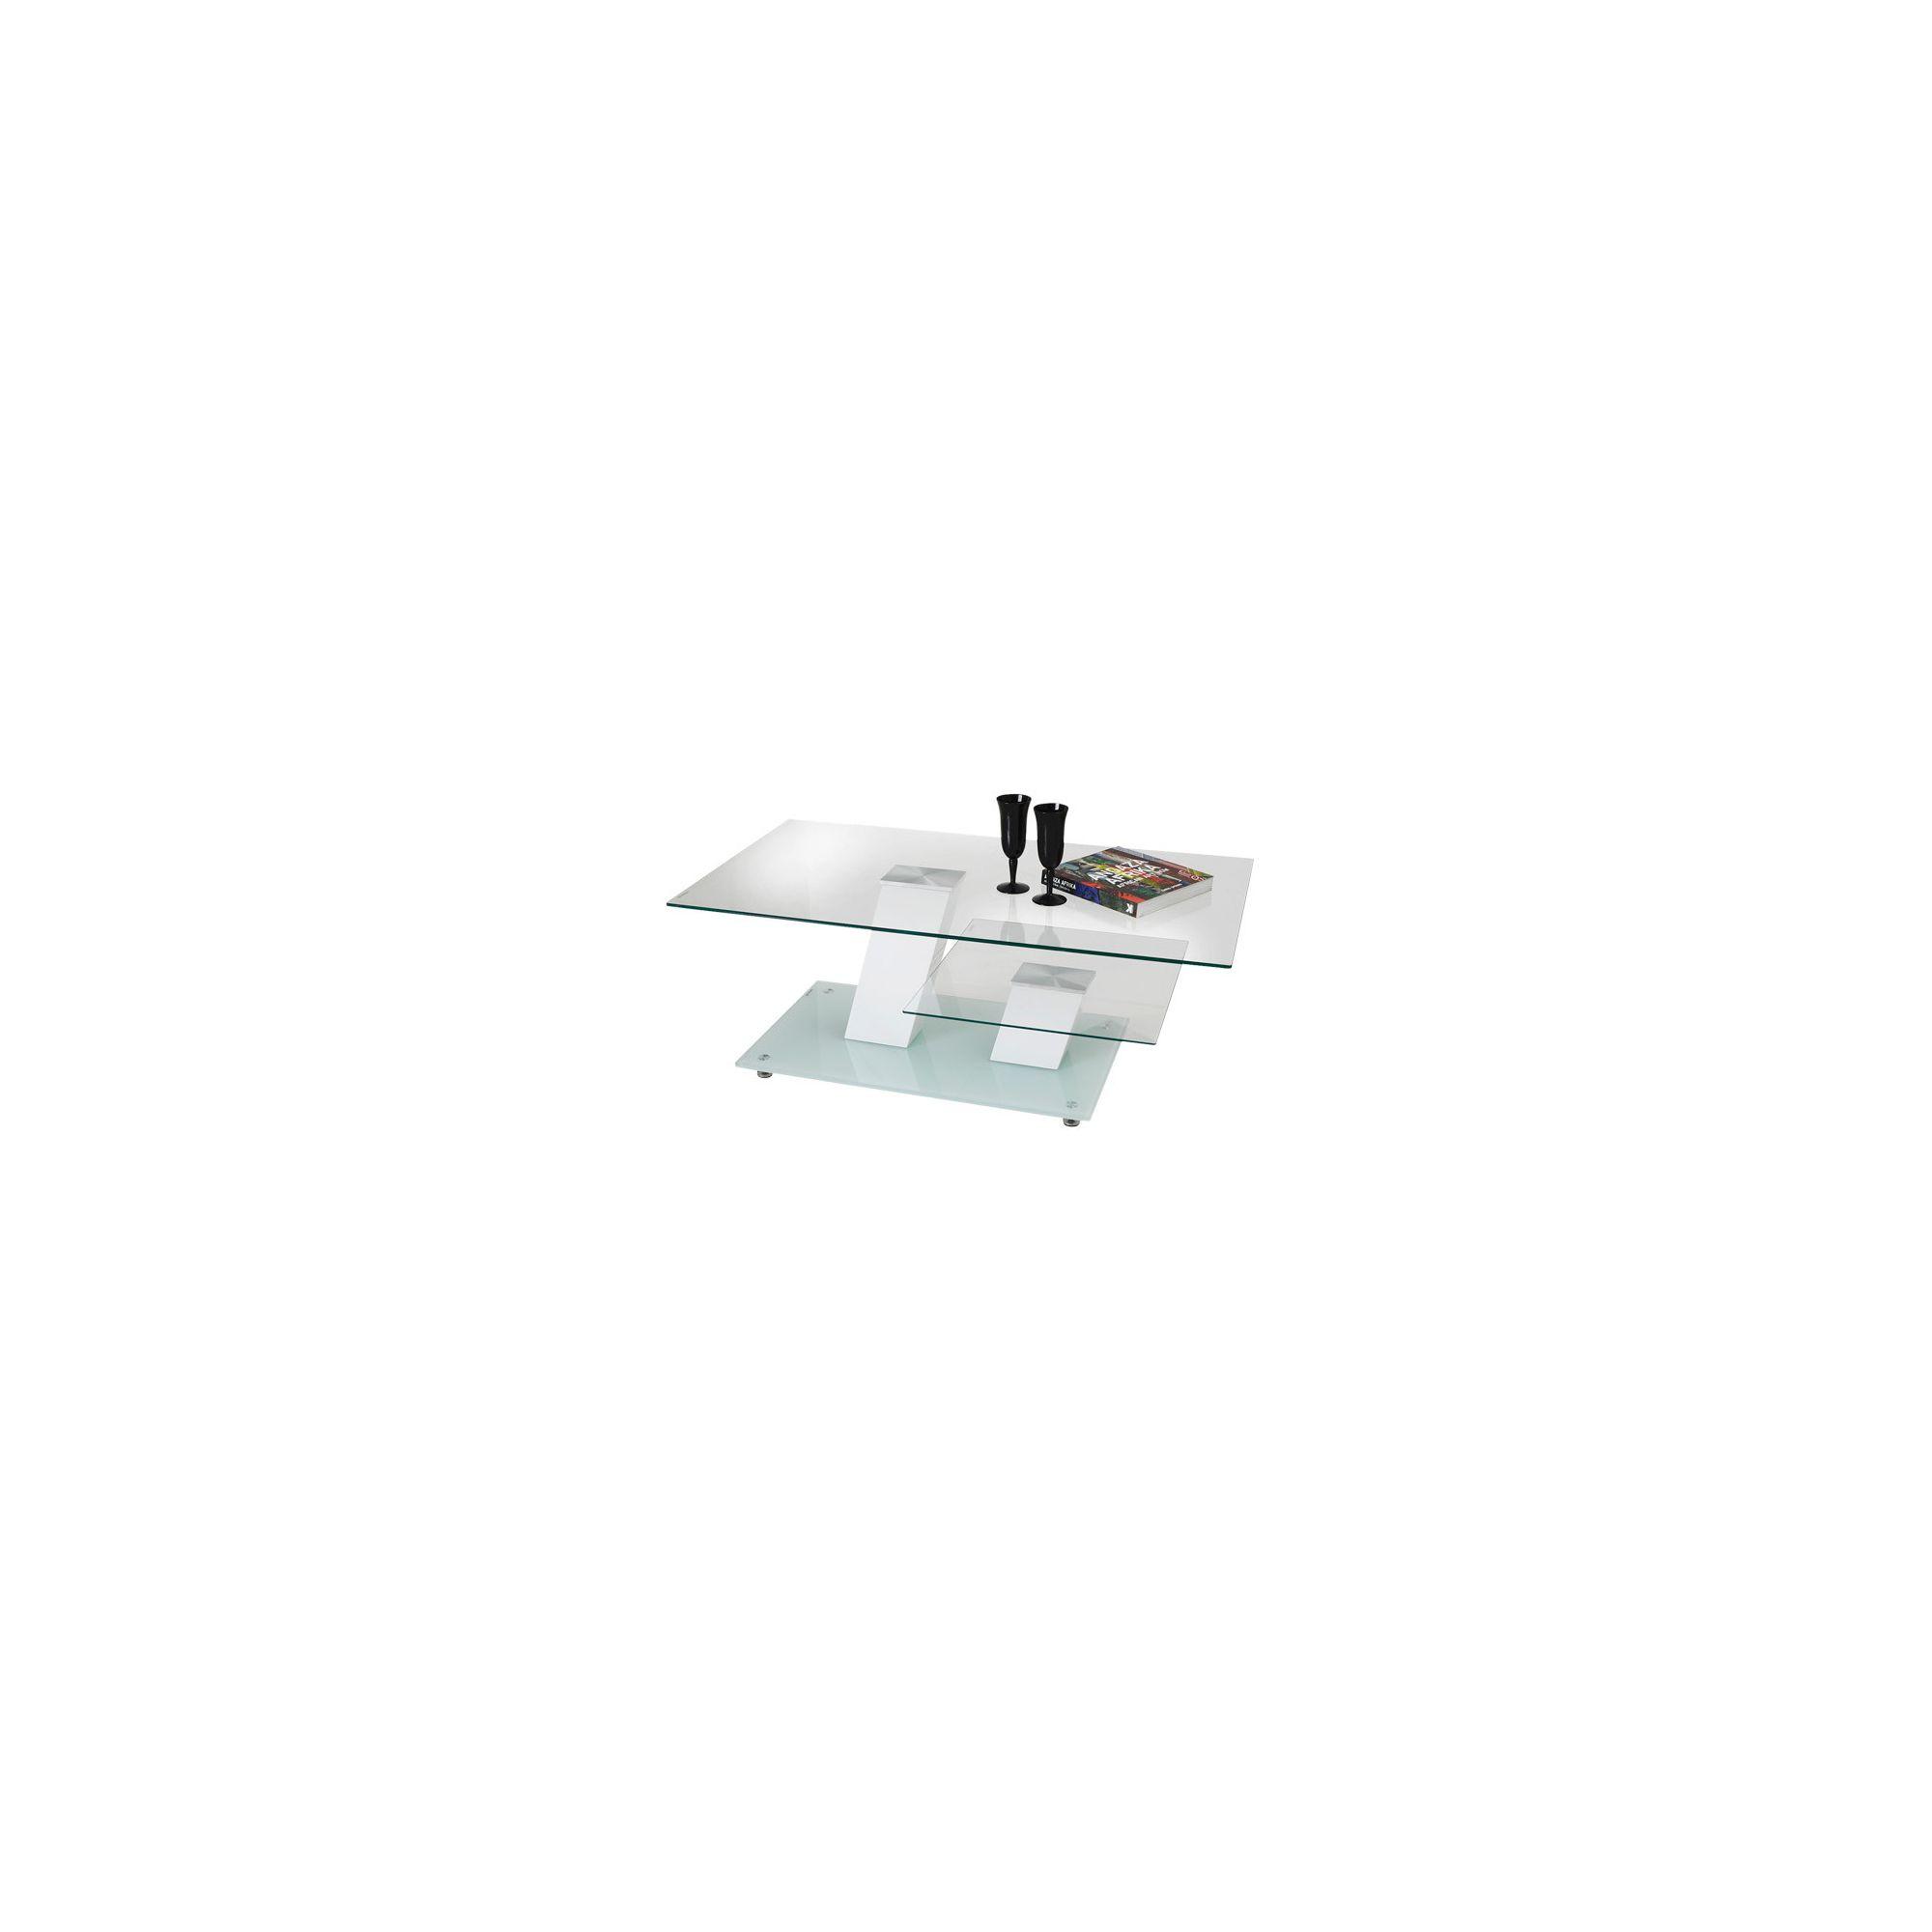 Wilkinson Furniture Zirco Coffee Table - White